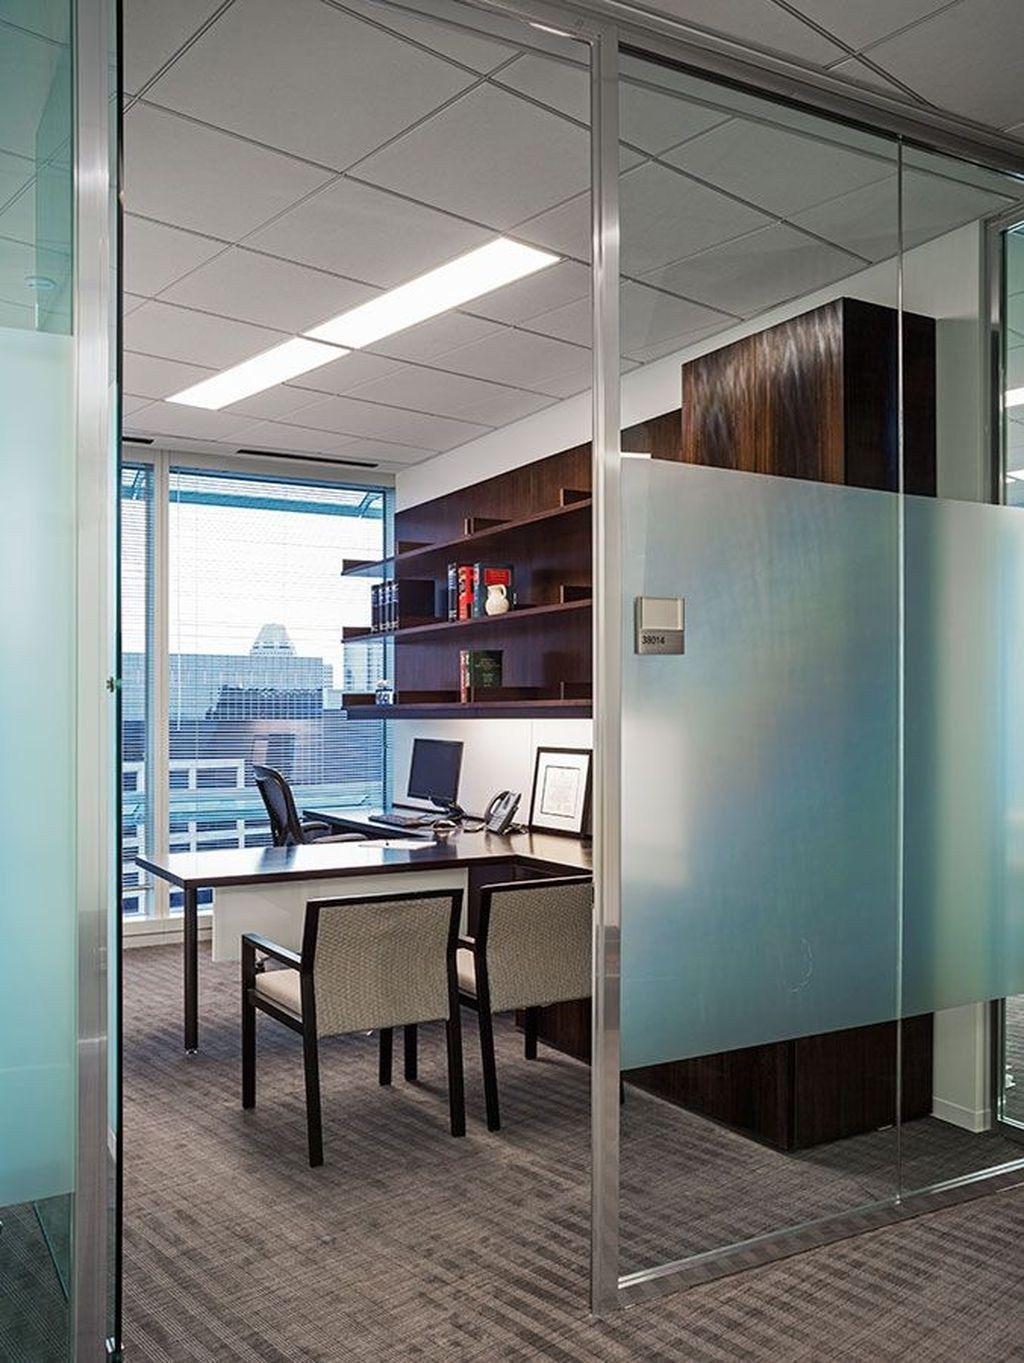 Law Office Interior Design Ideas - valoblogi.com